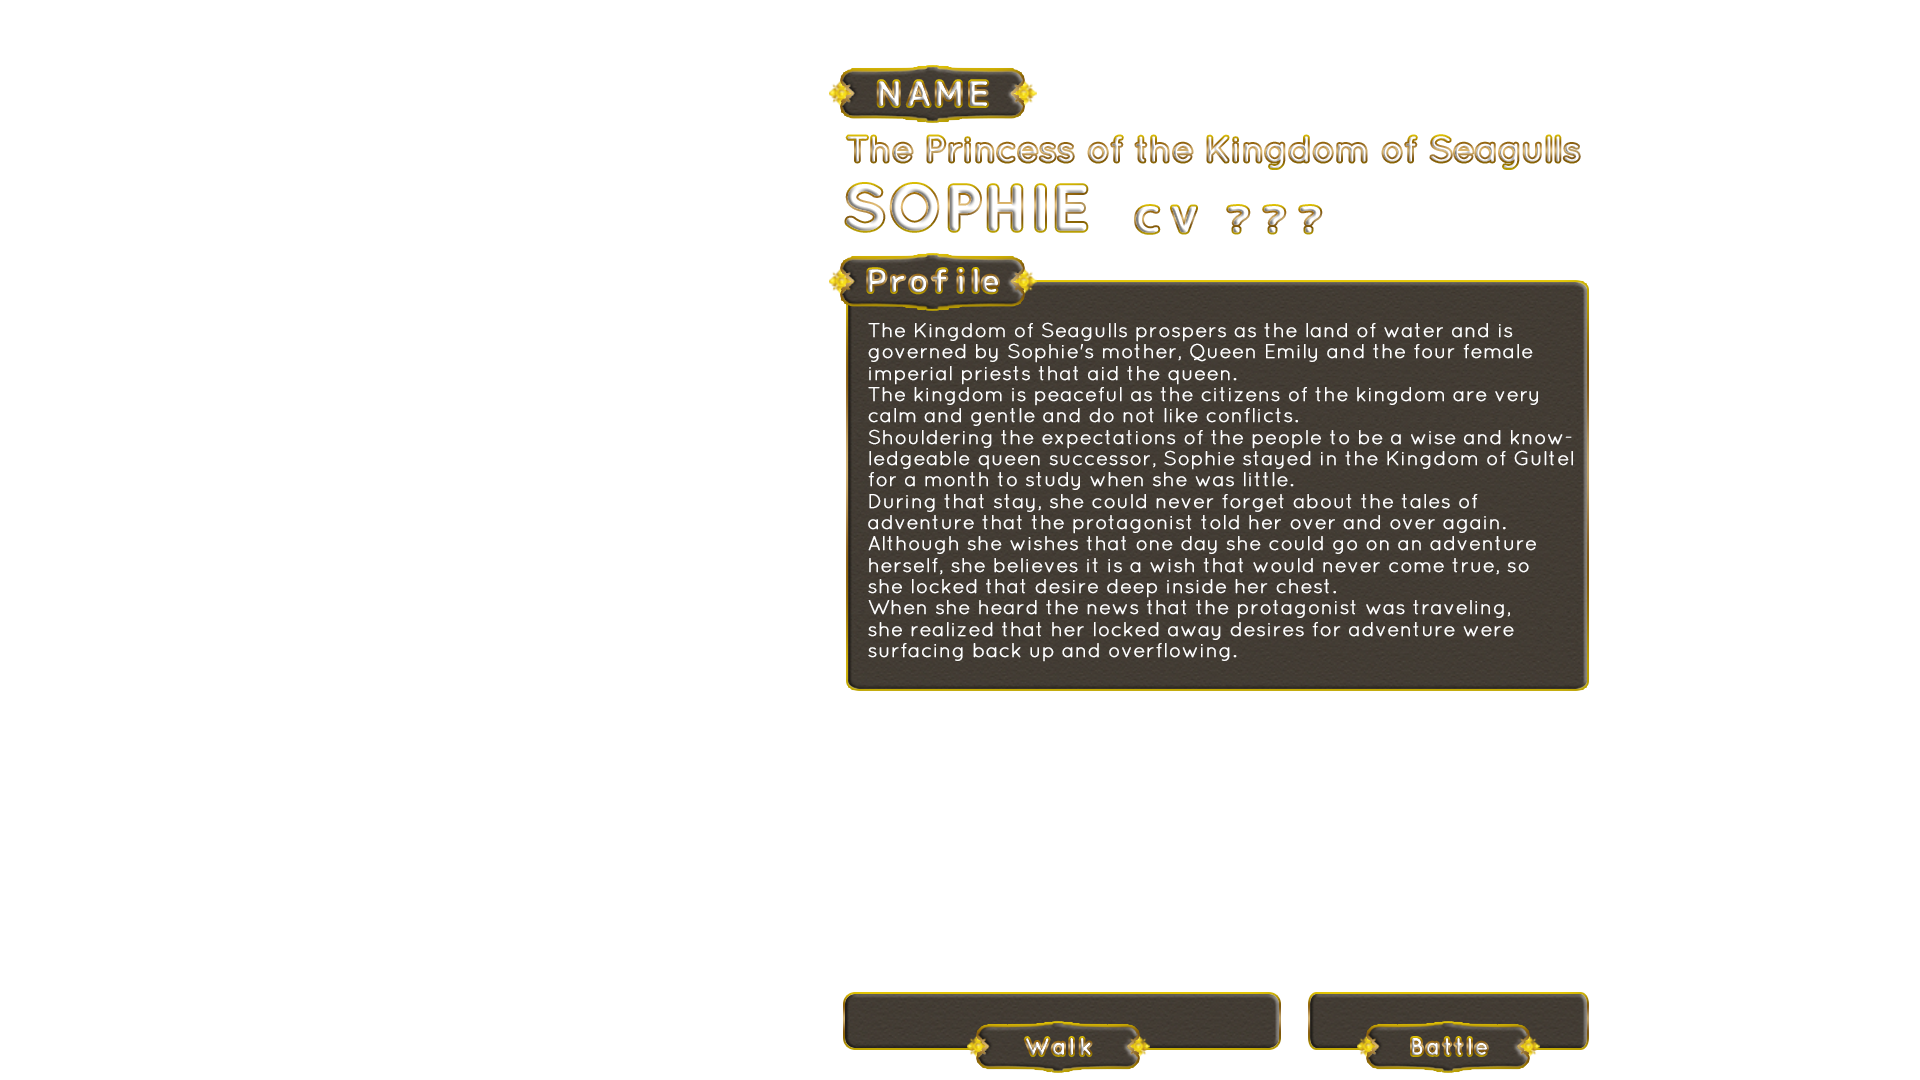 sophie_profile